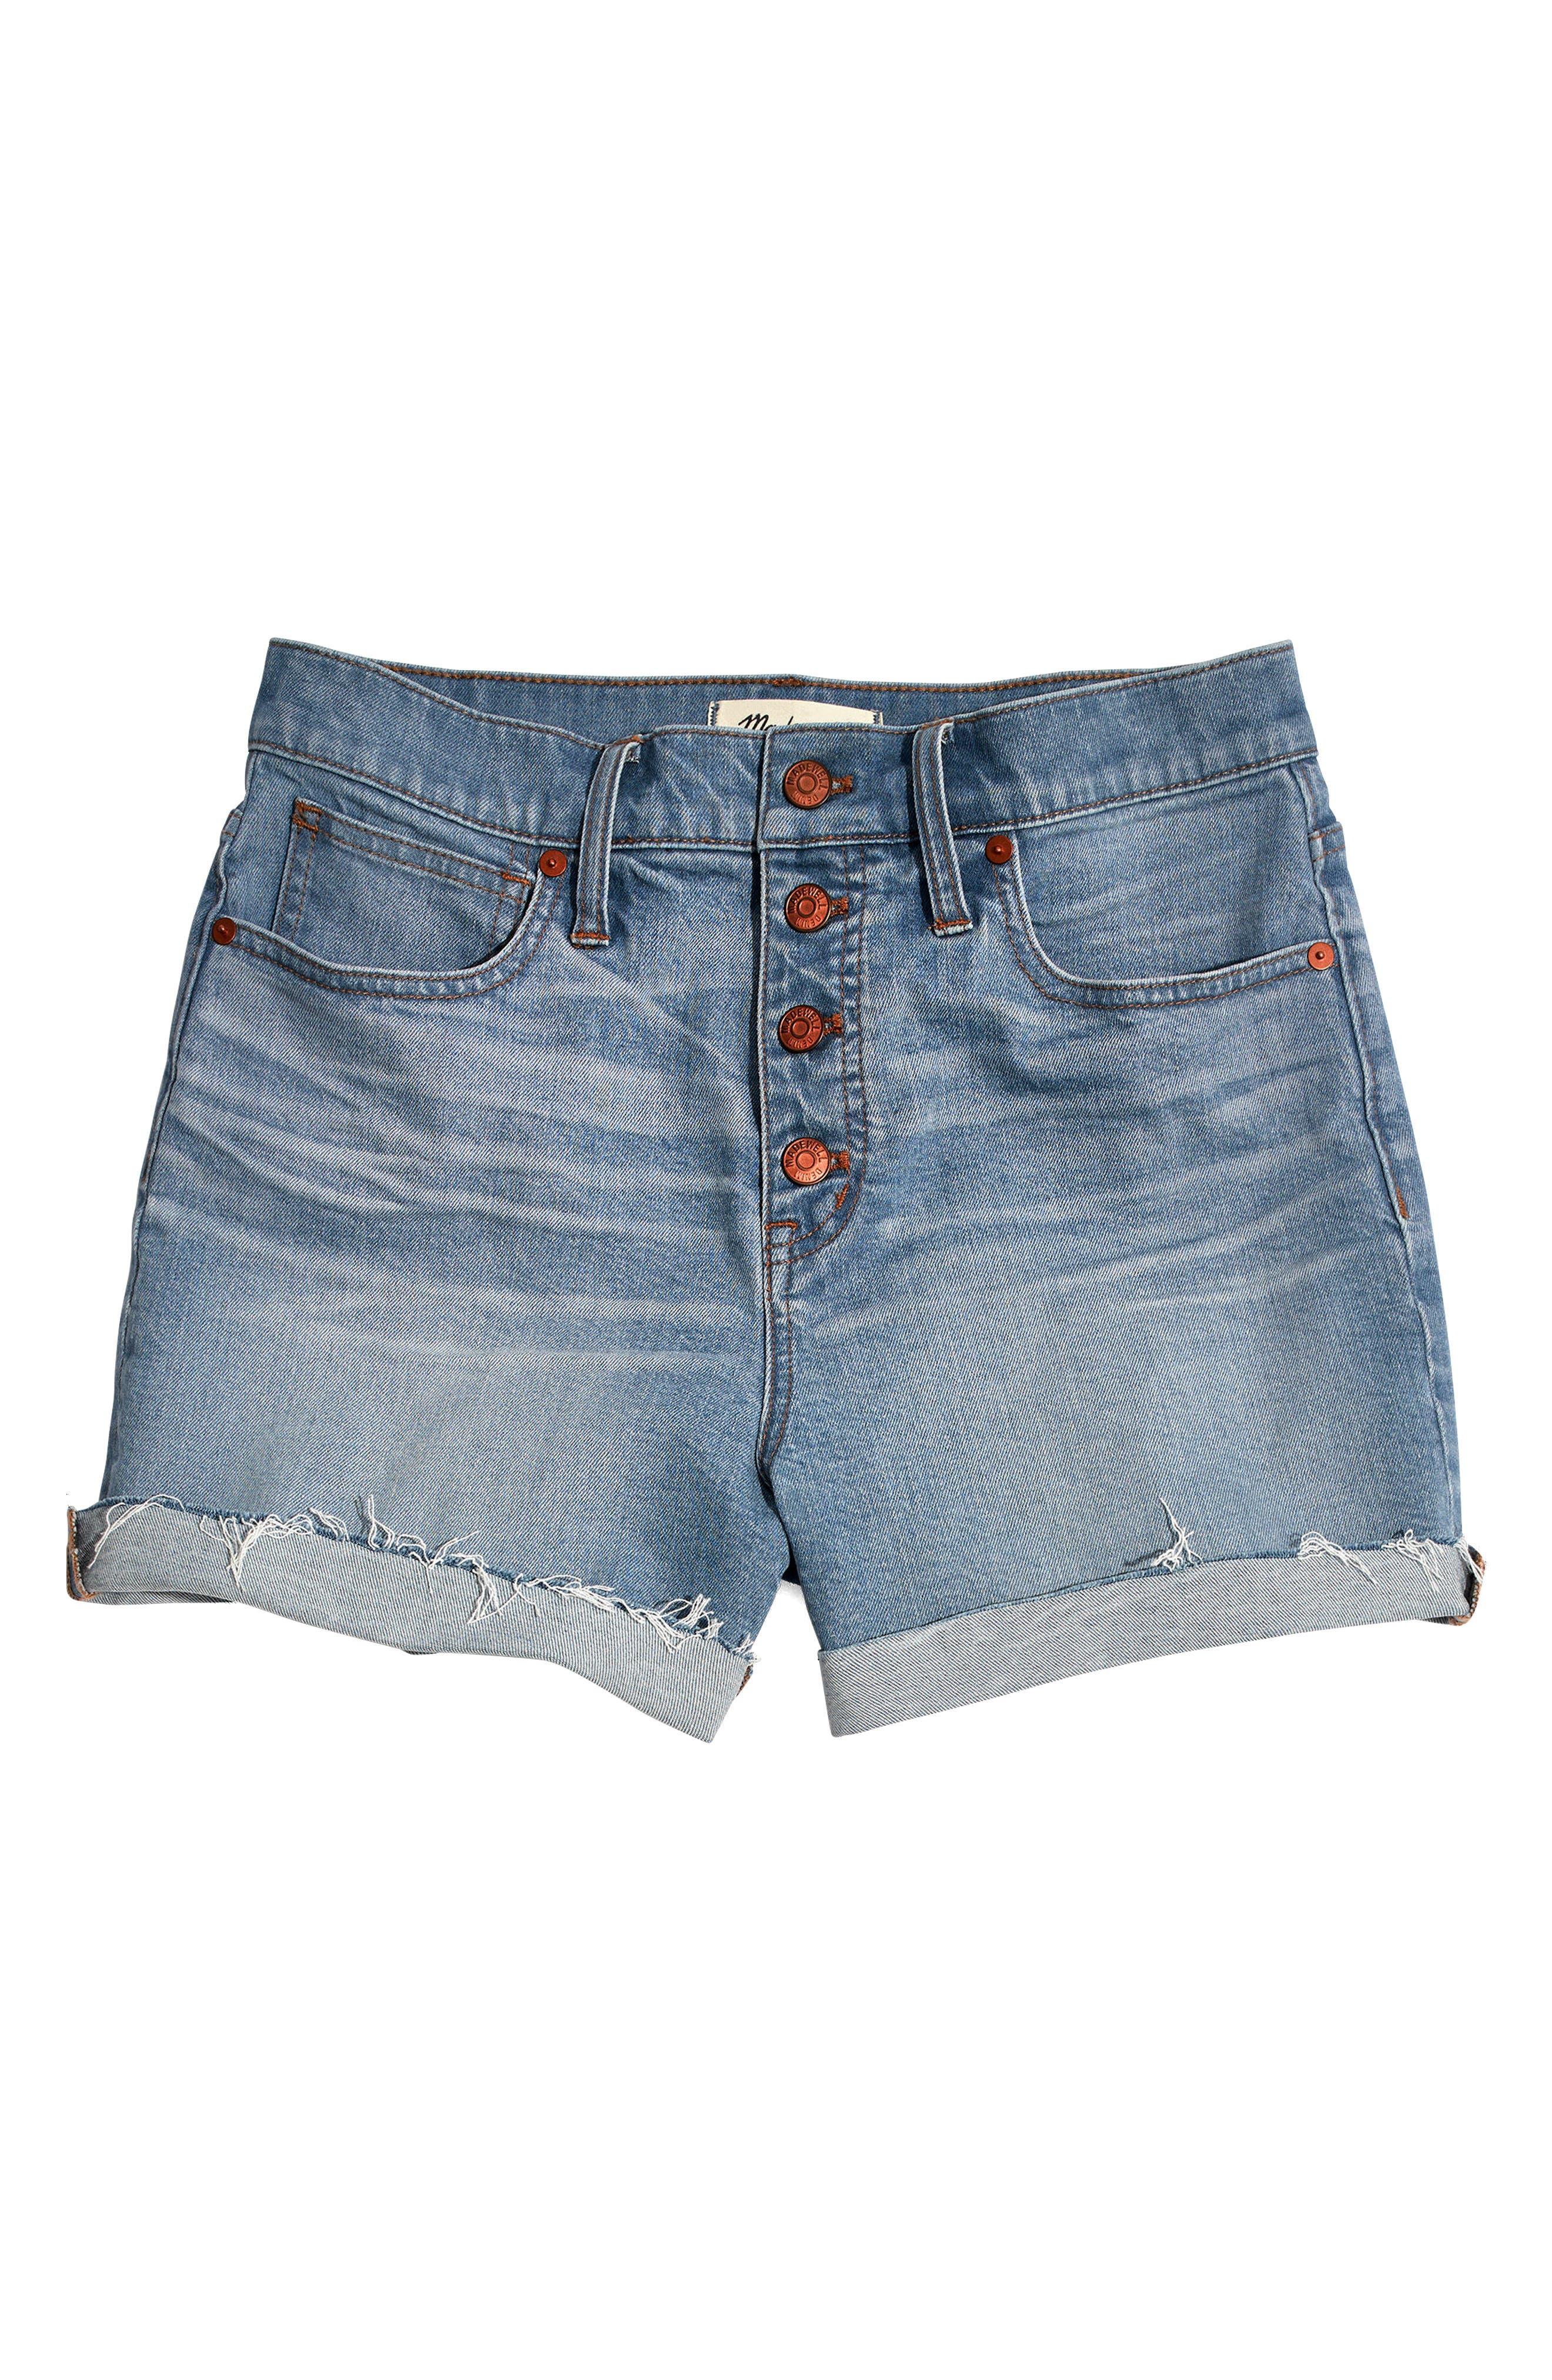 MADEWELL,                             Button Front High Waist Denim Shorts,                             Alternate thumbnail 5, color,                             400